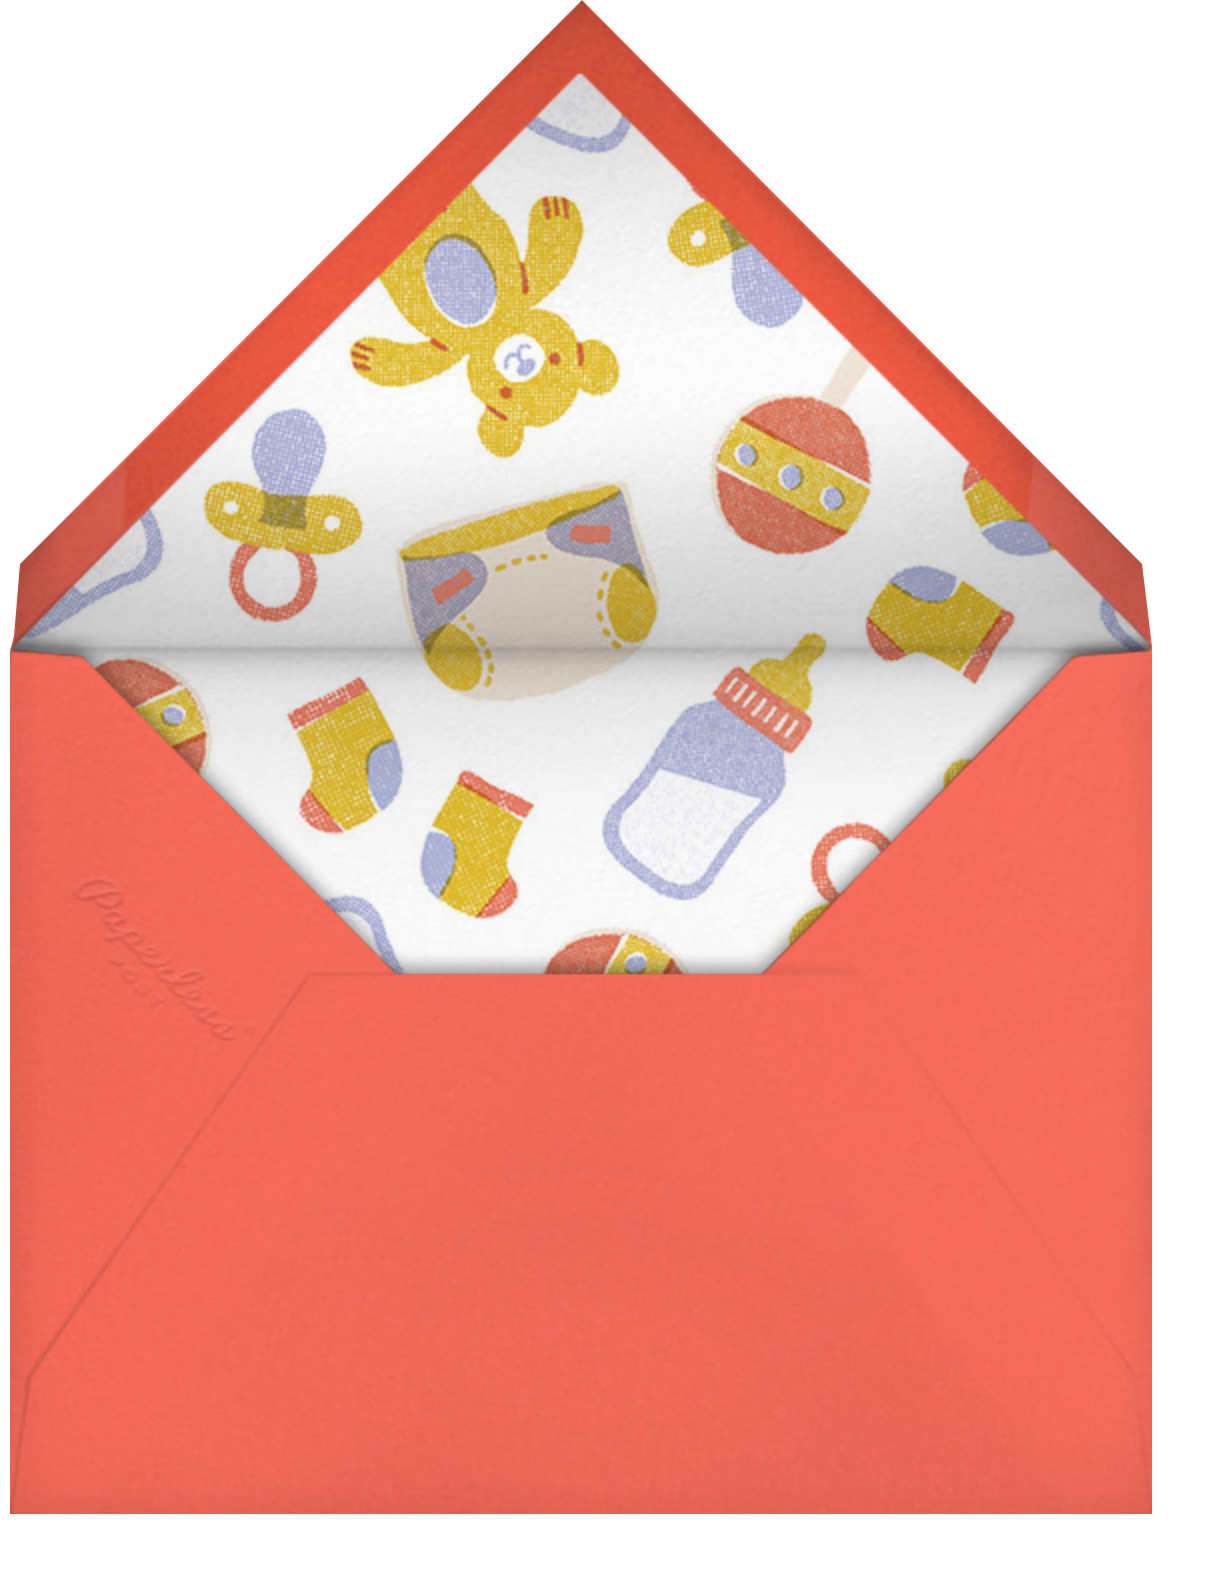 In The Bag - Paperless Post - Envelope